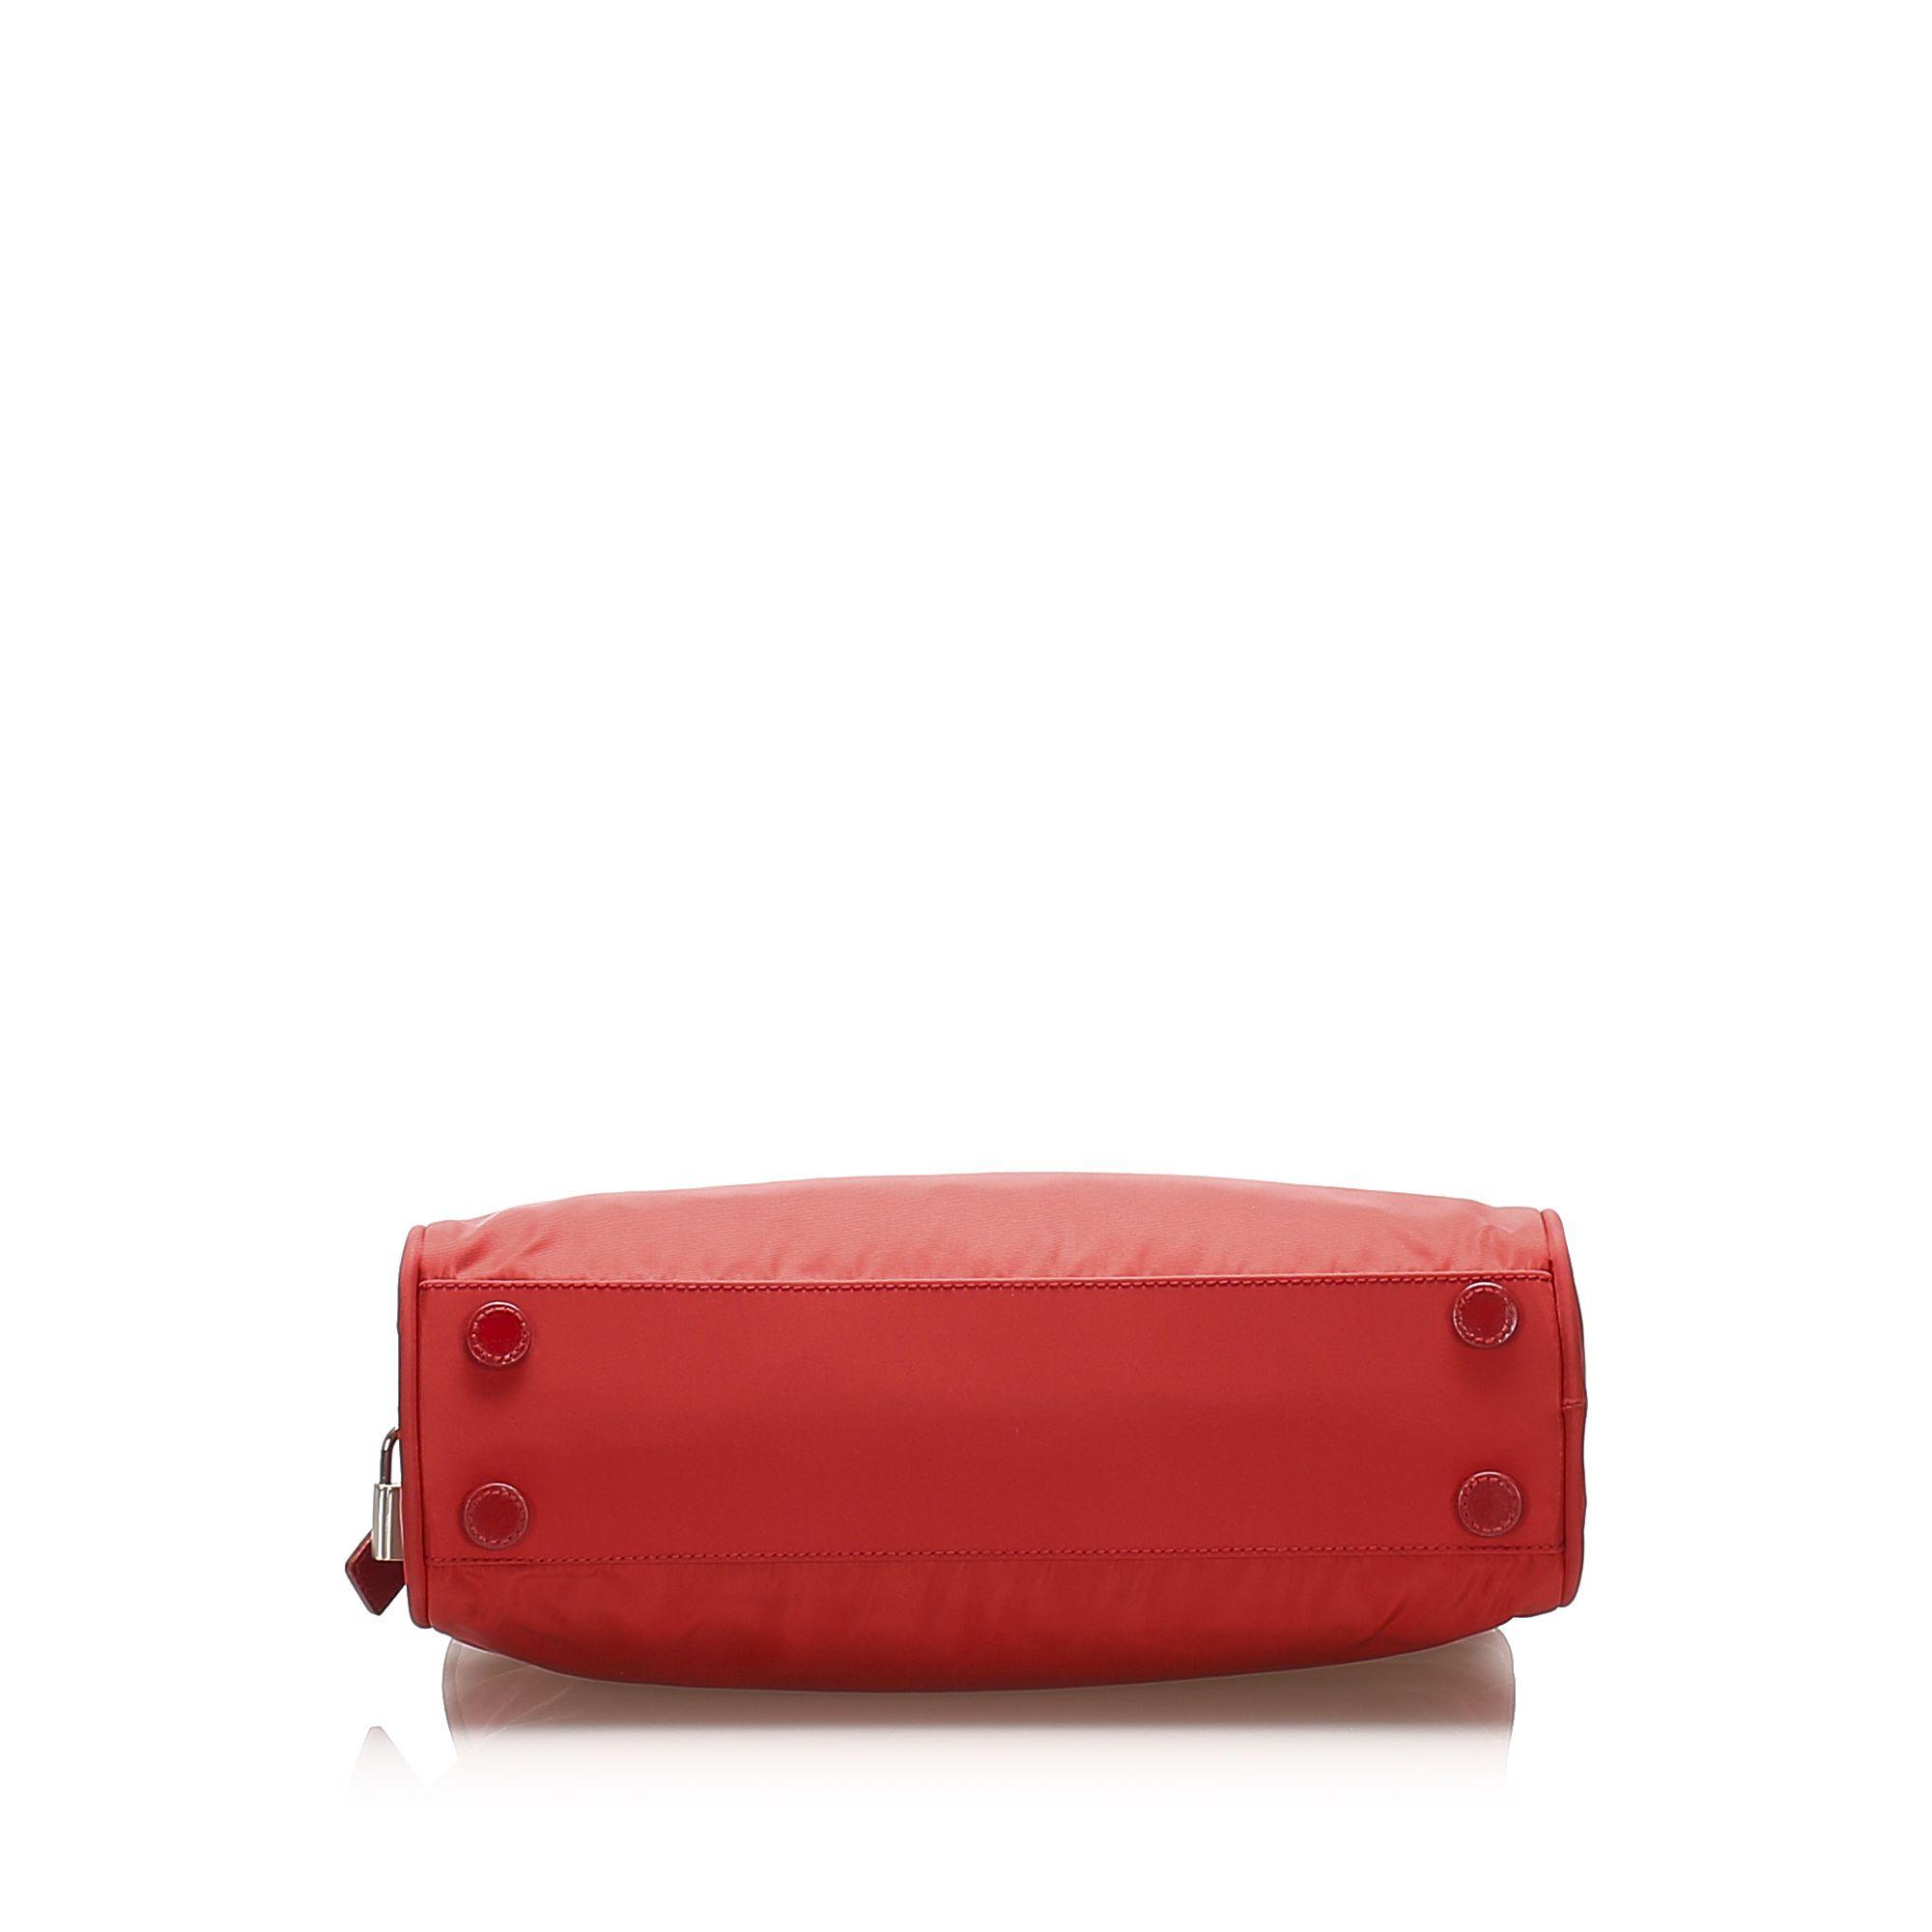 Vintage Prada Tessuto Handbag Red